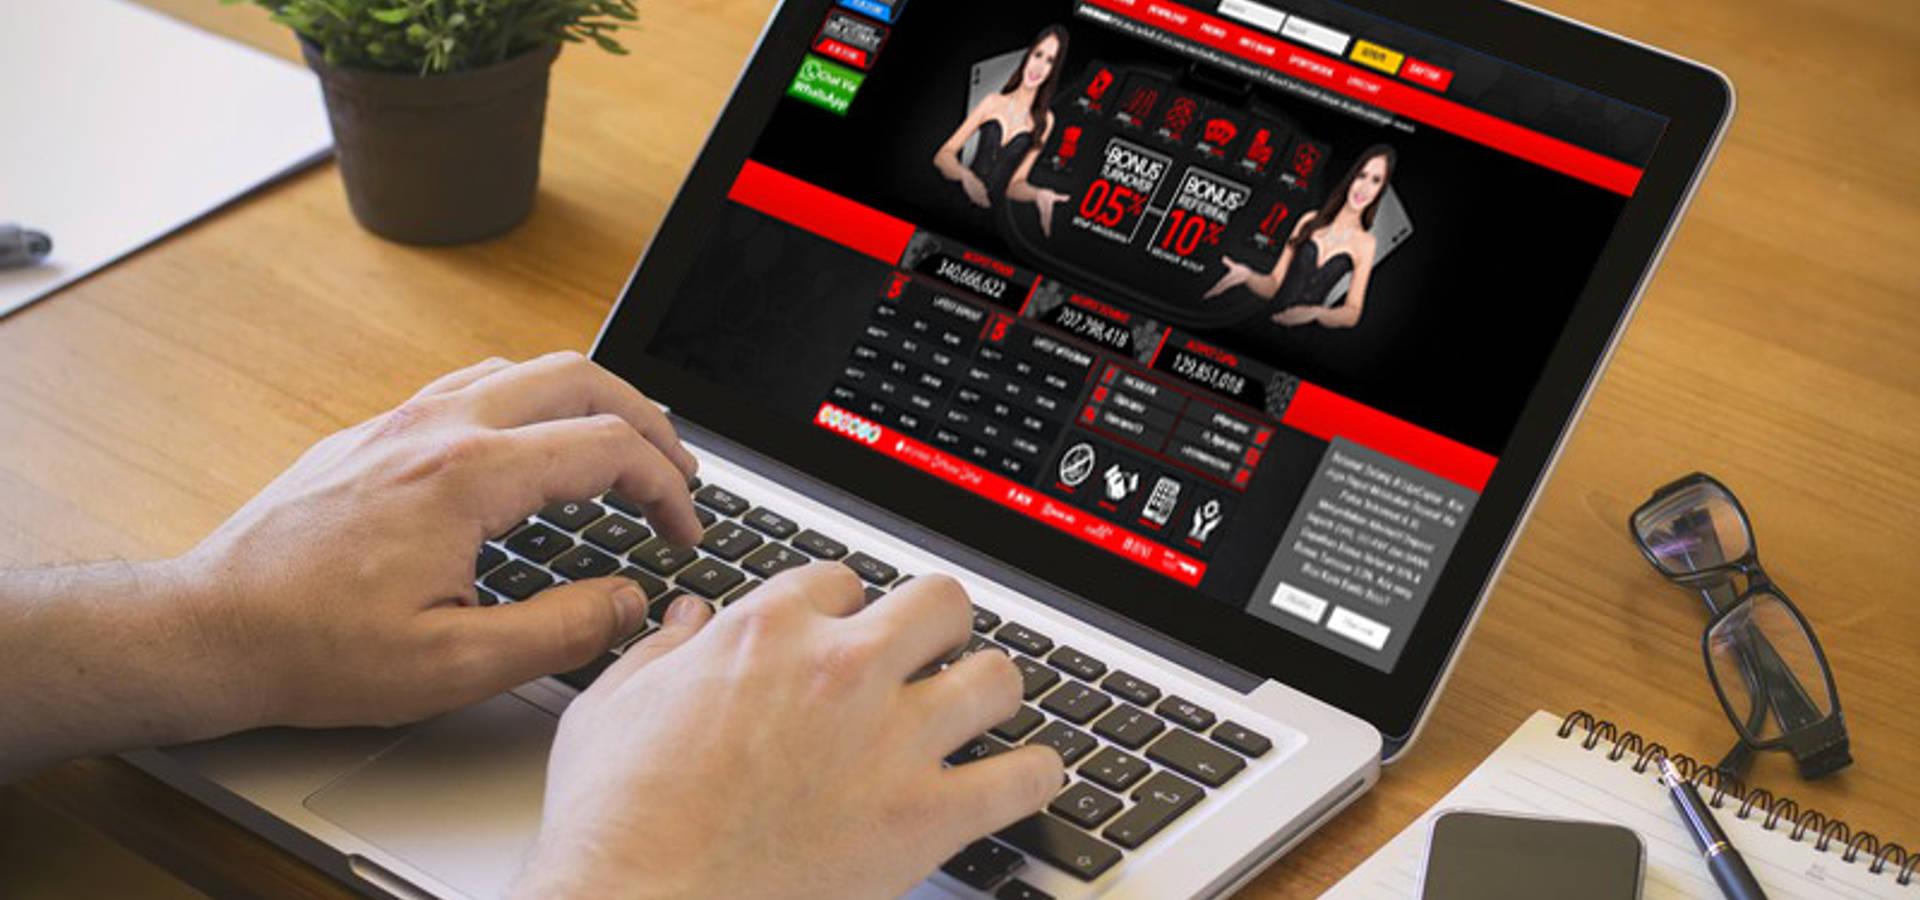 Daftar Agen Situs Bandar Poker PKV Games Online